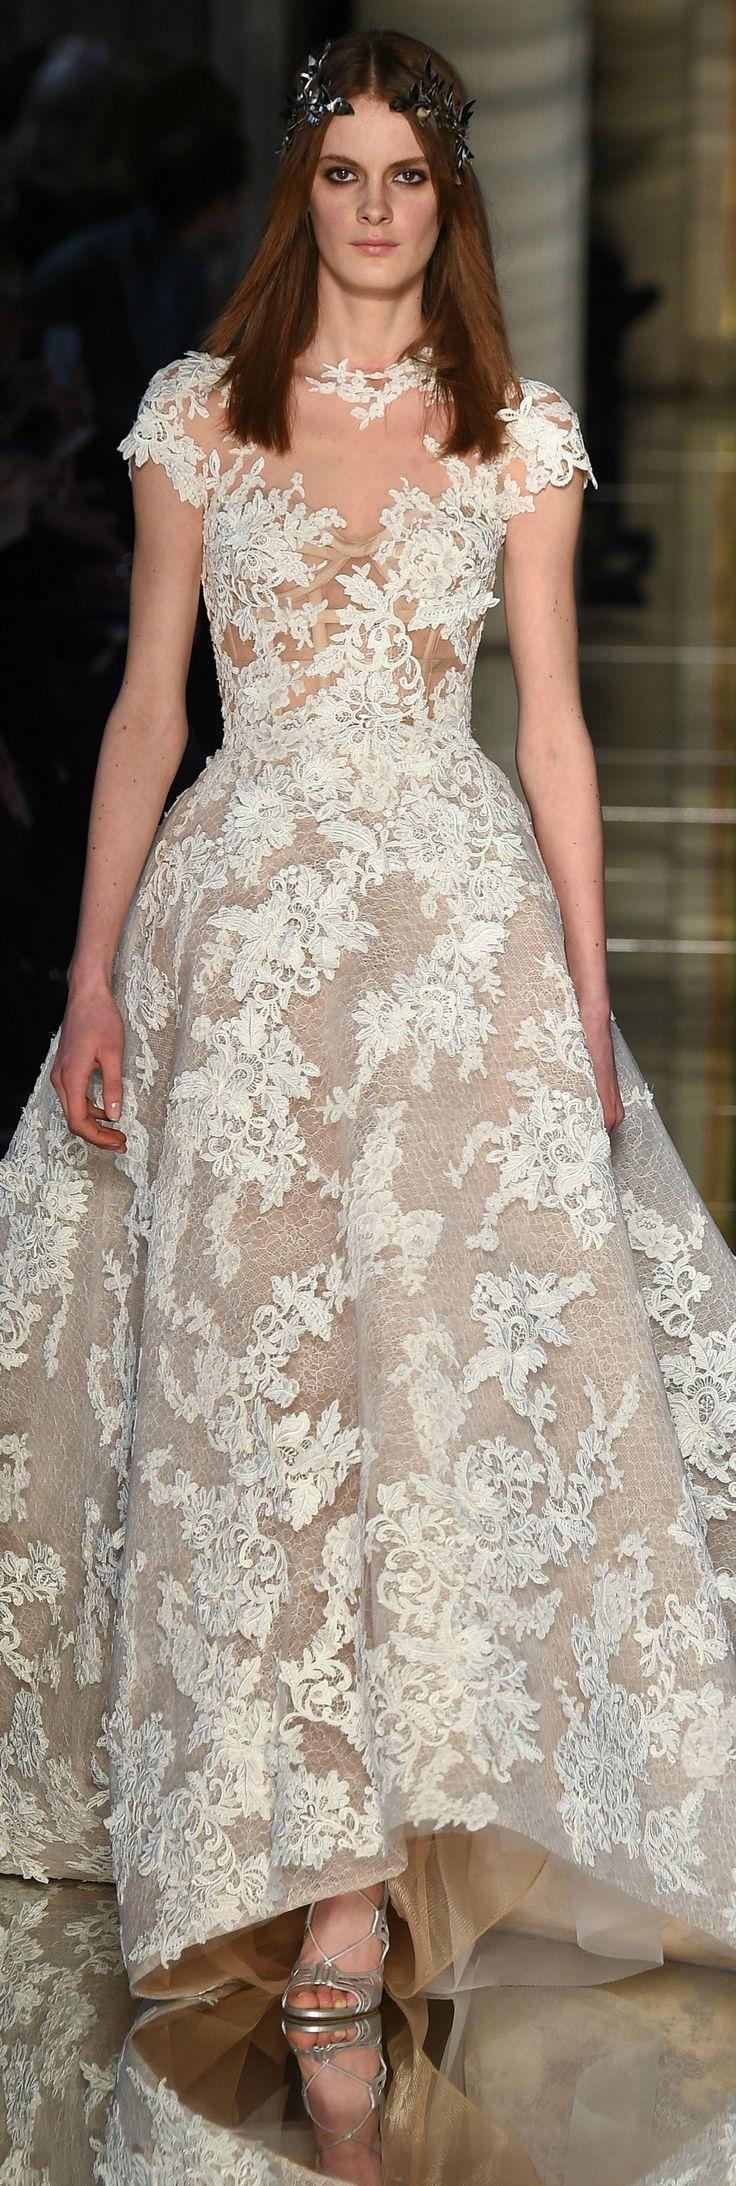 Zuhair Murad Spring 2016 Couture Collection